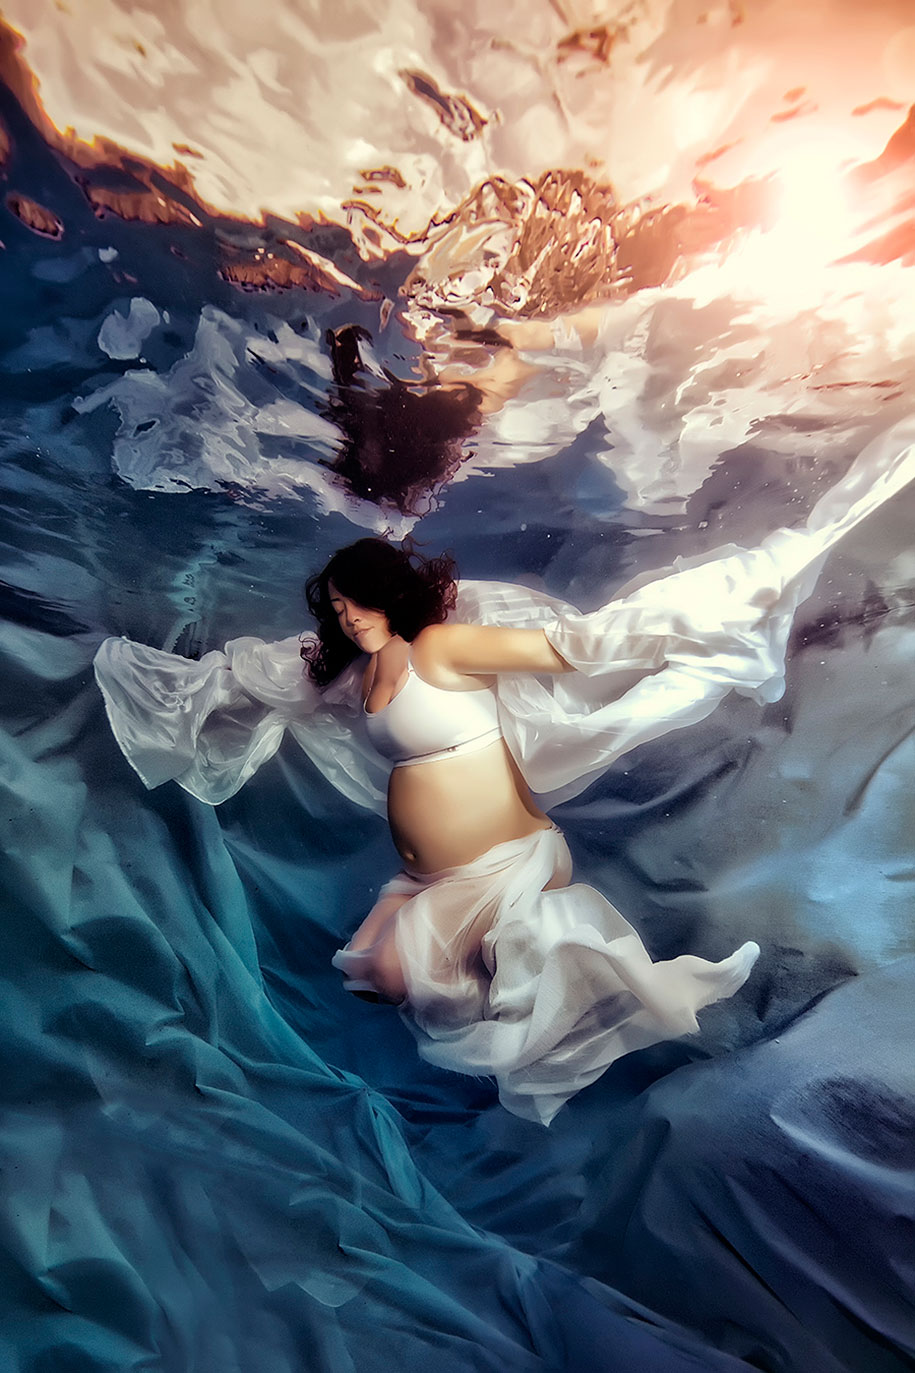 underwater-maternity-photography-mermaids-adam-opris-9